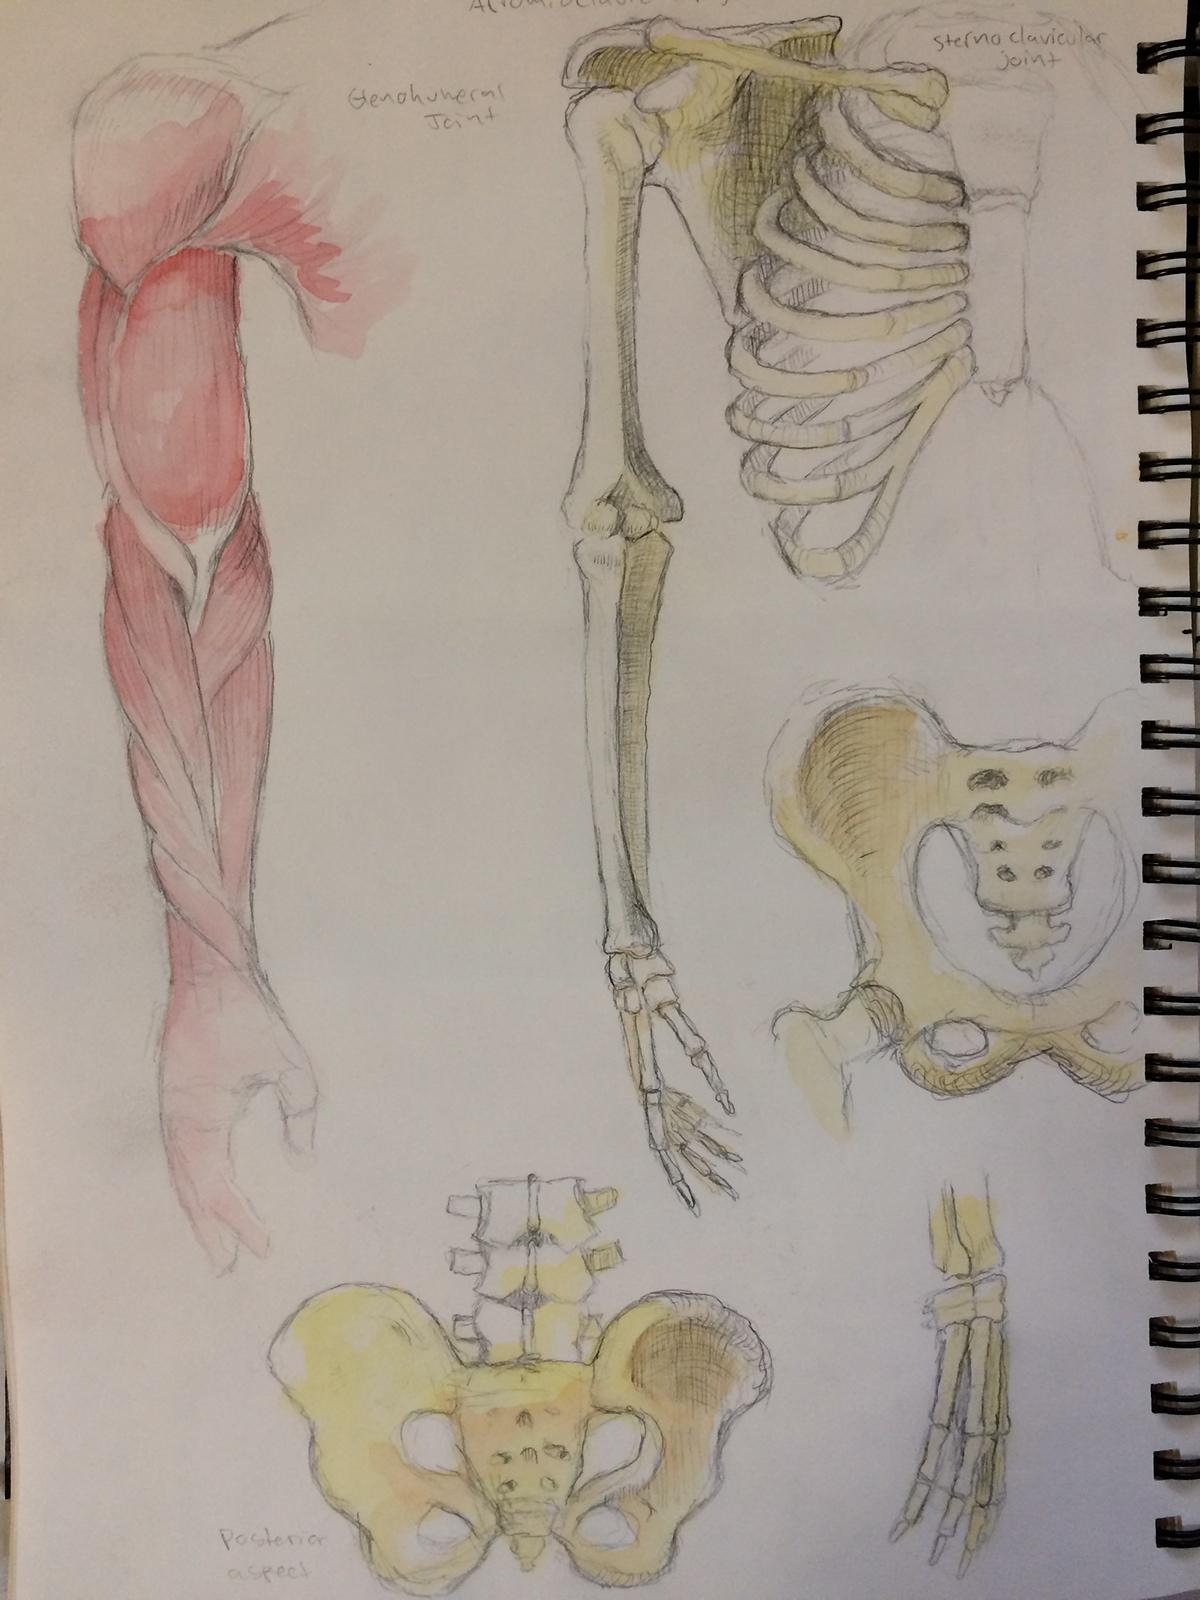 Anatomical Studies on Behance